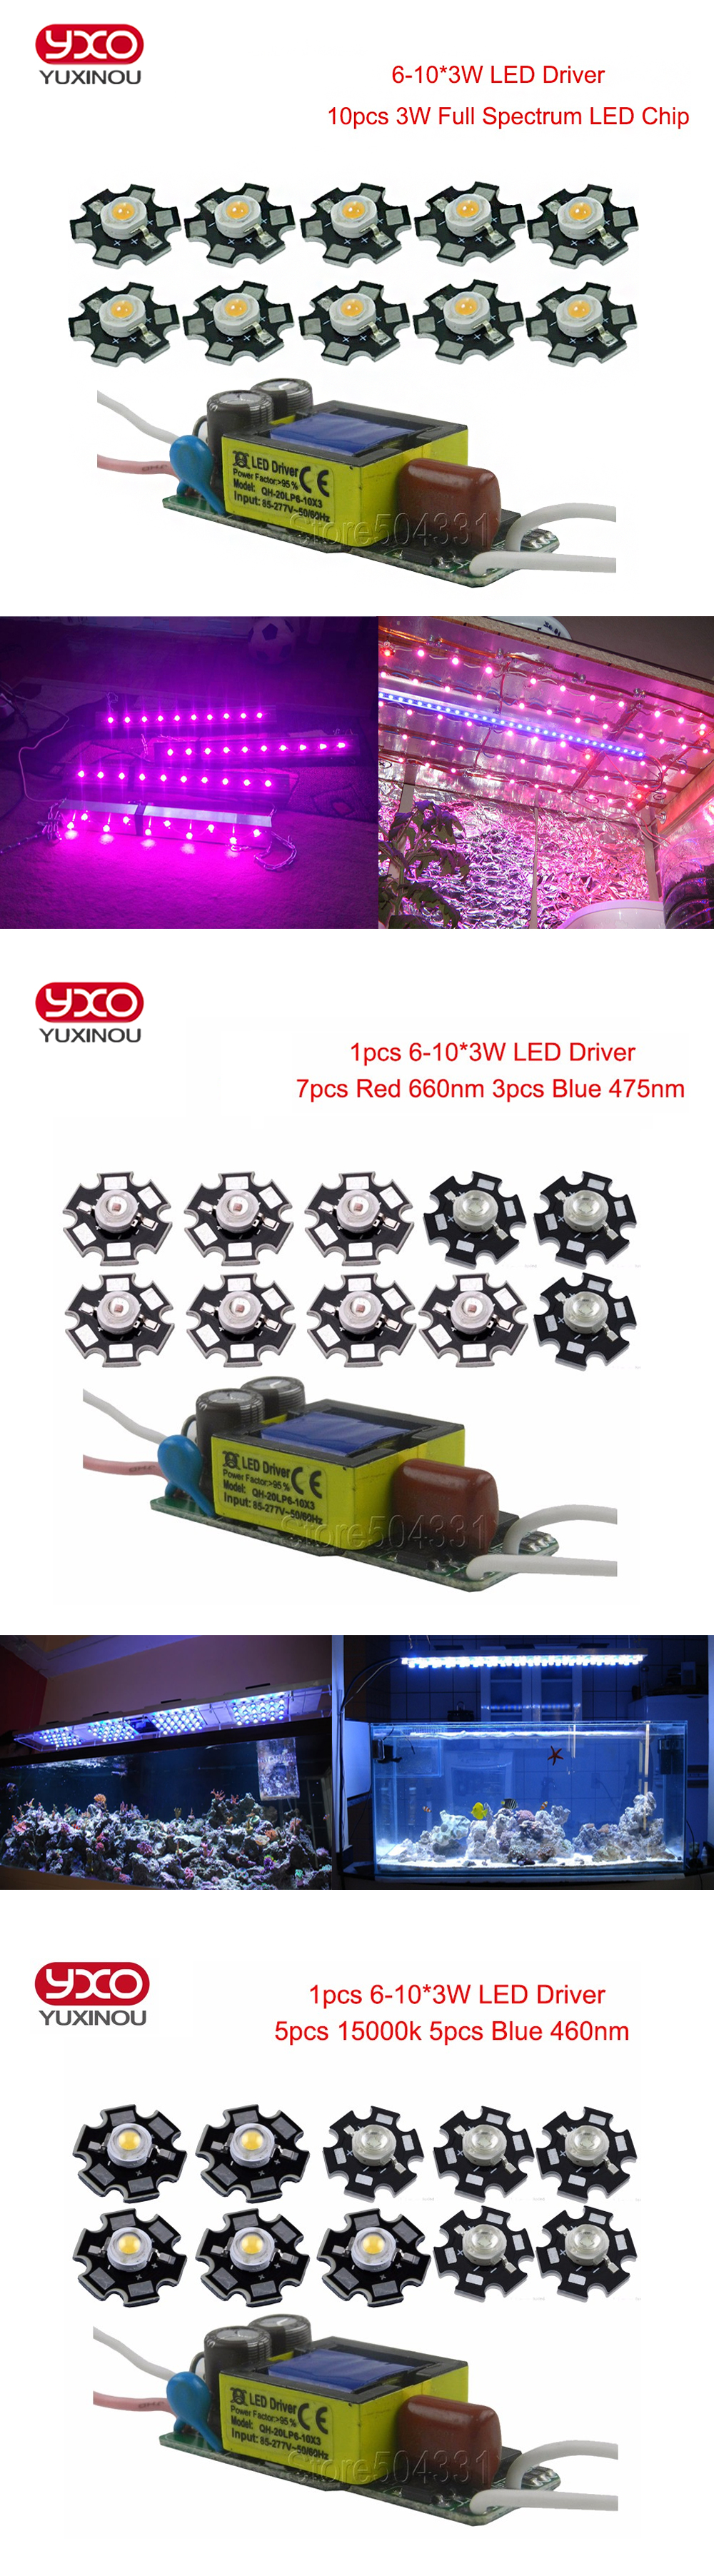 10pcs 3w Full Spectrum Led 380 840nm 1pcs 6 10x3w 600ma Driver Dc 512v 300ma Circuit Buy 3wled 01 02 03